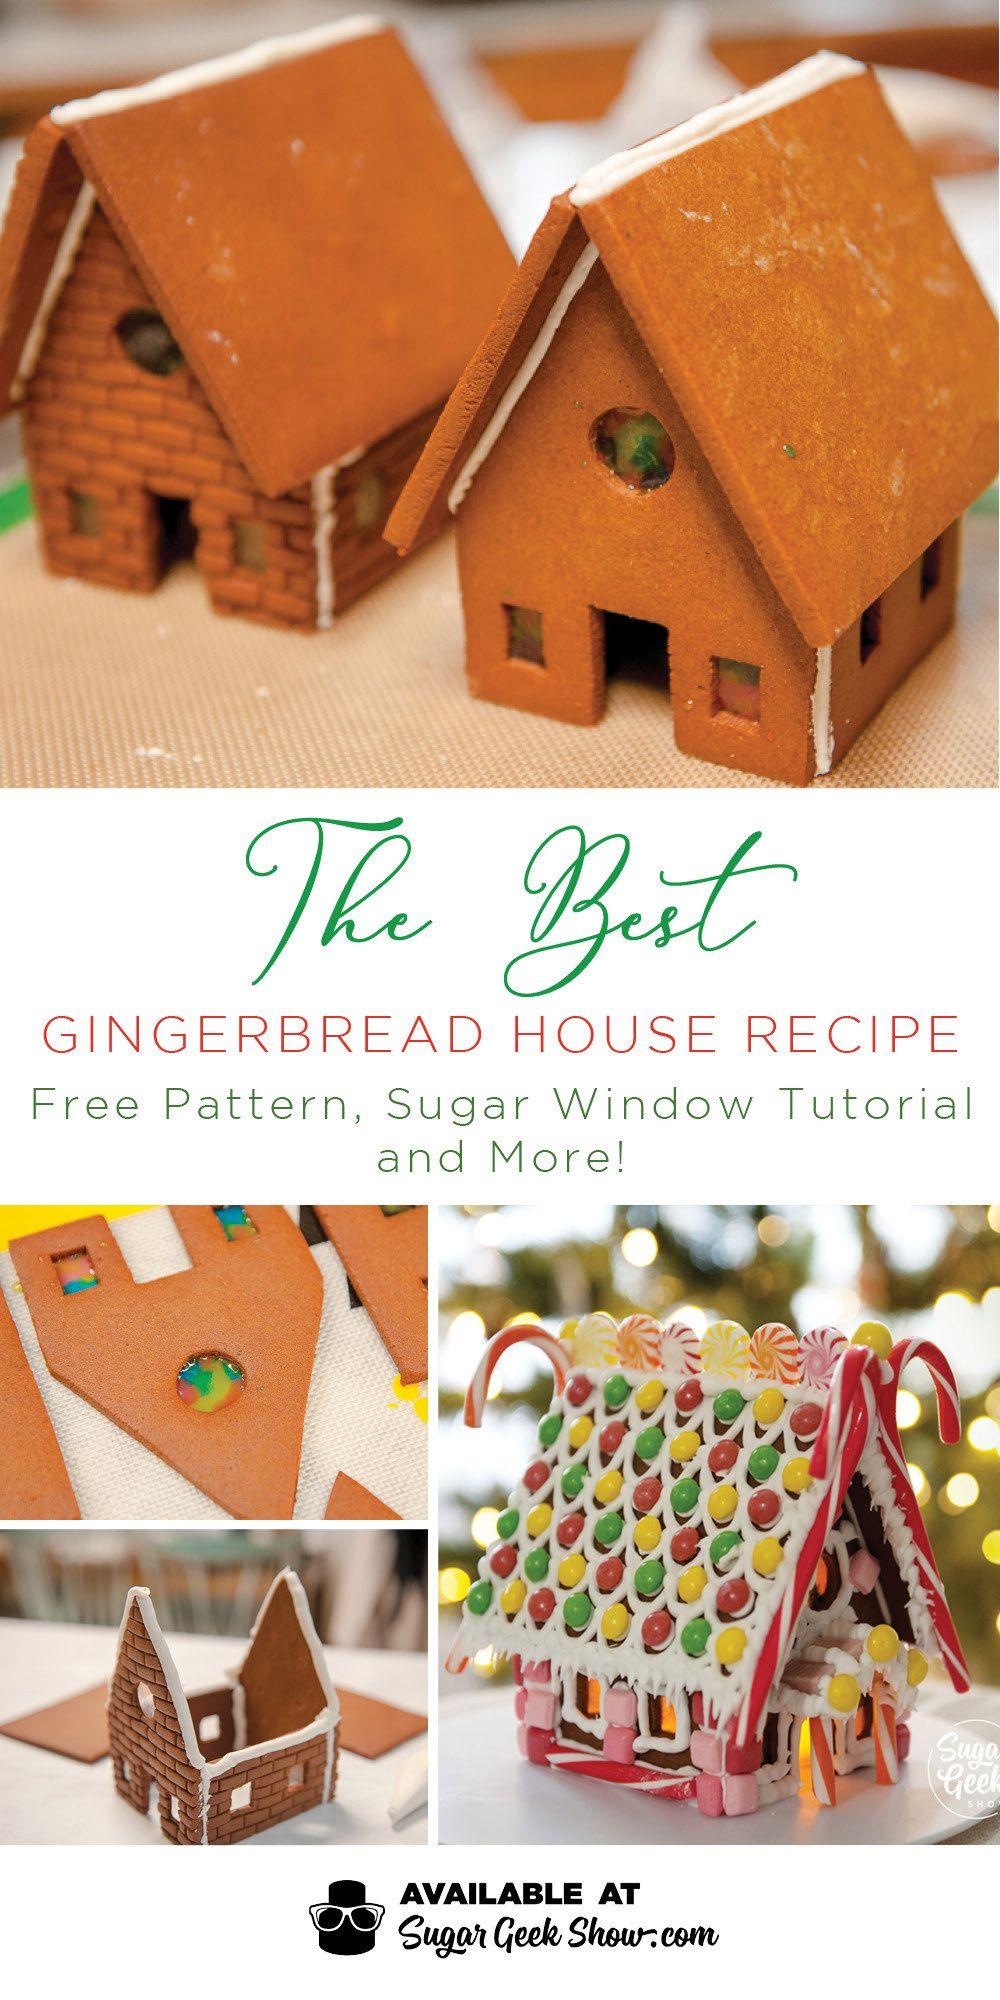 Gingerbread House Recipe + Template (Video Tutorial) | Sugar Geek Show